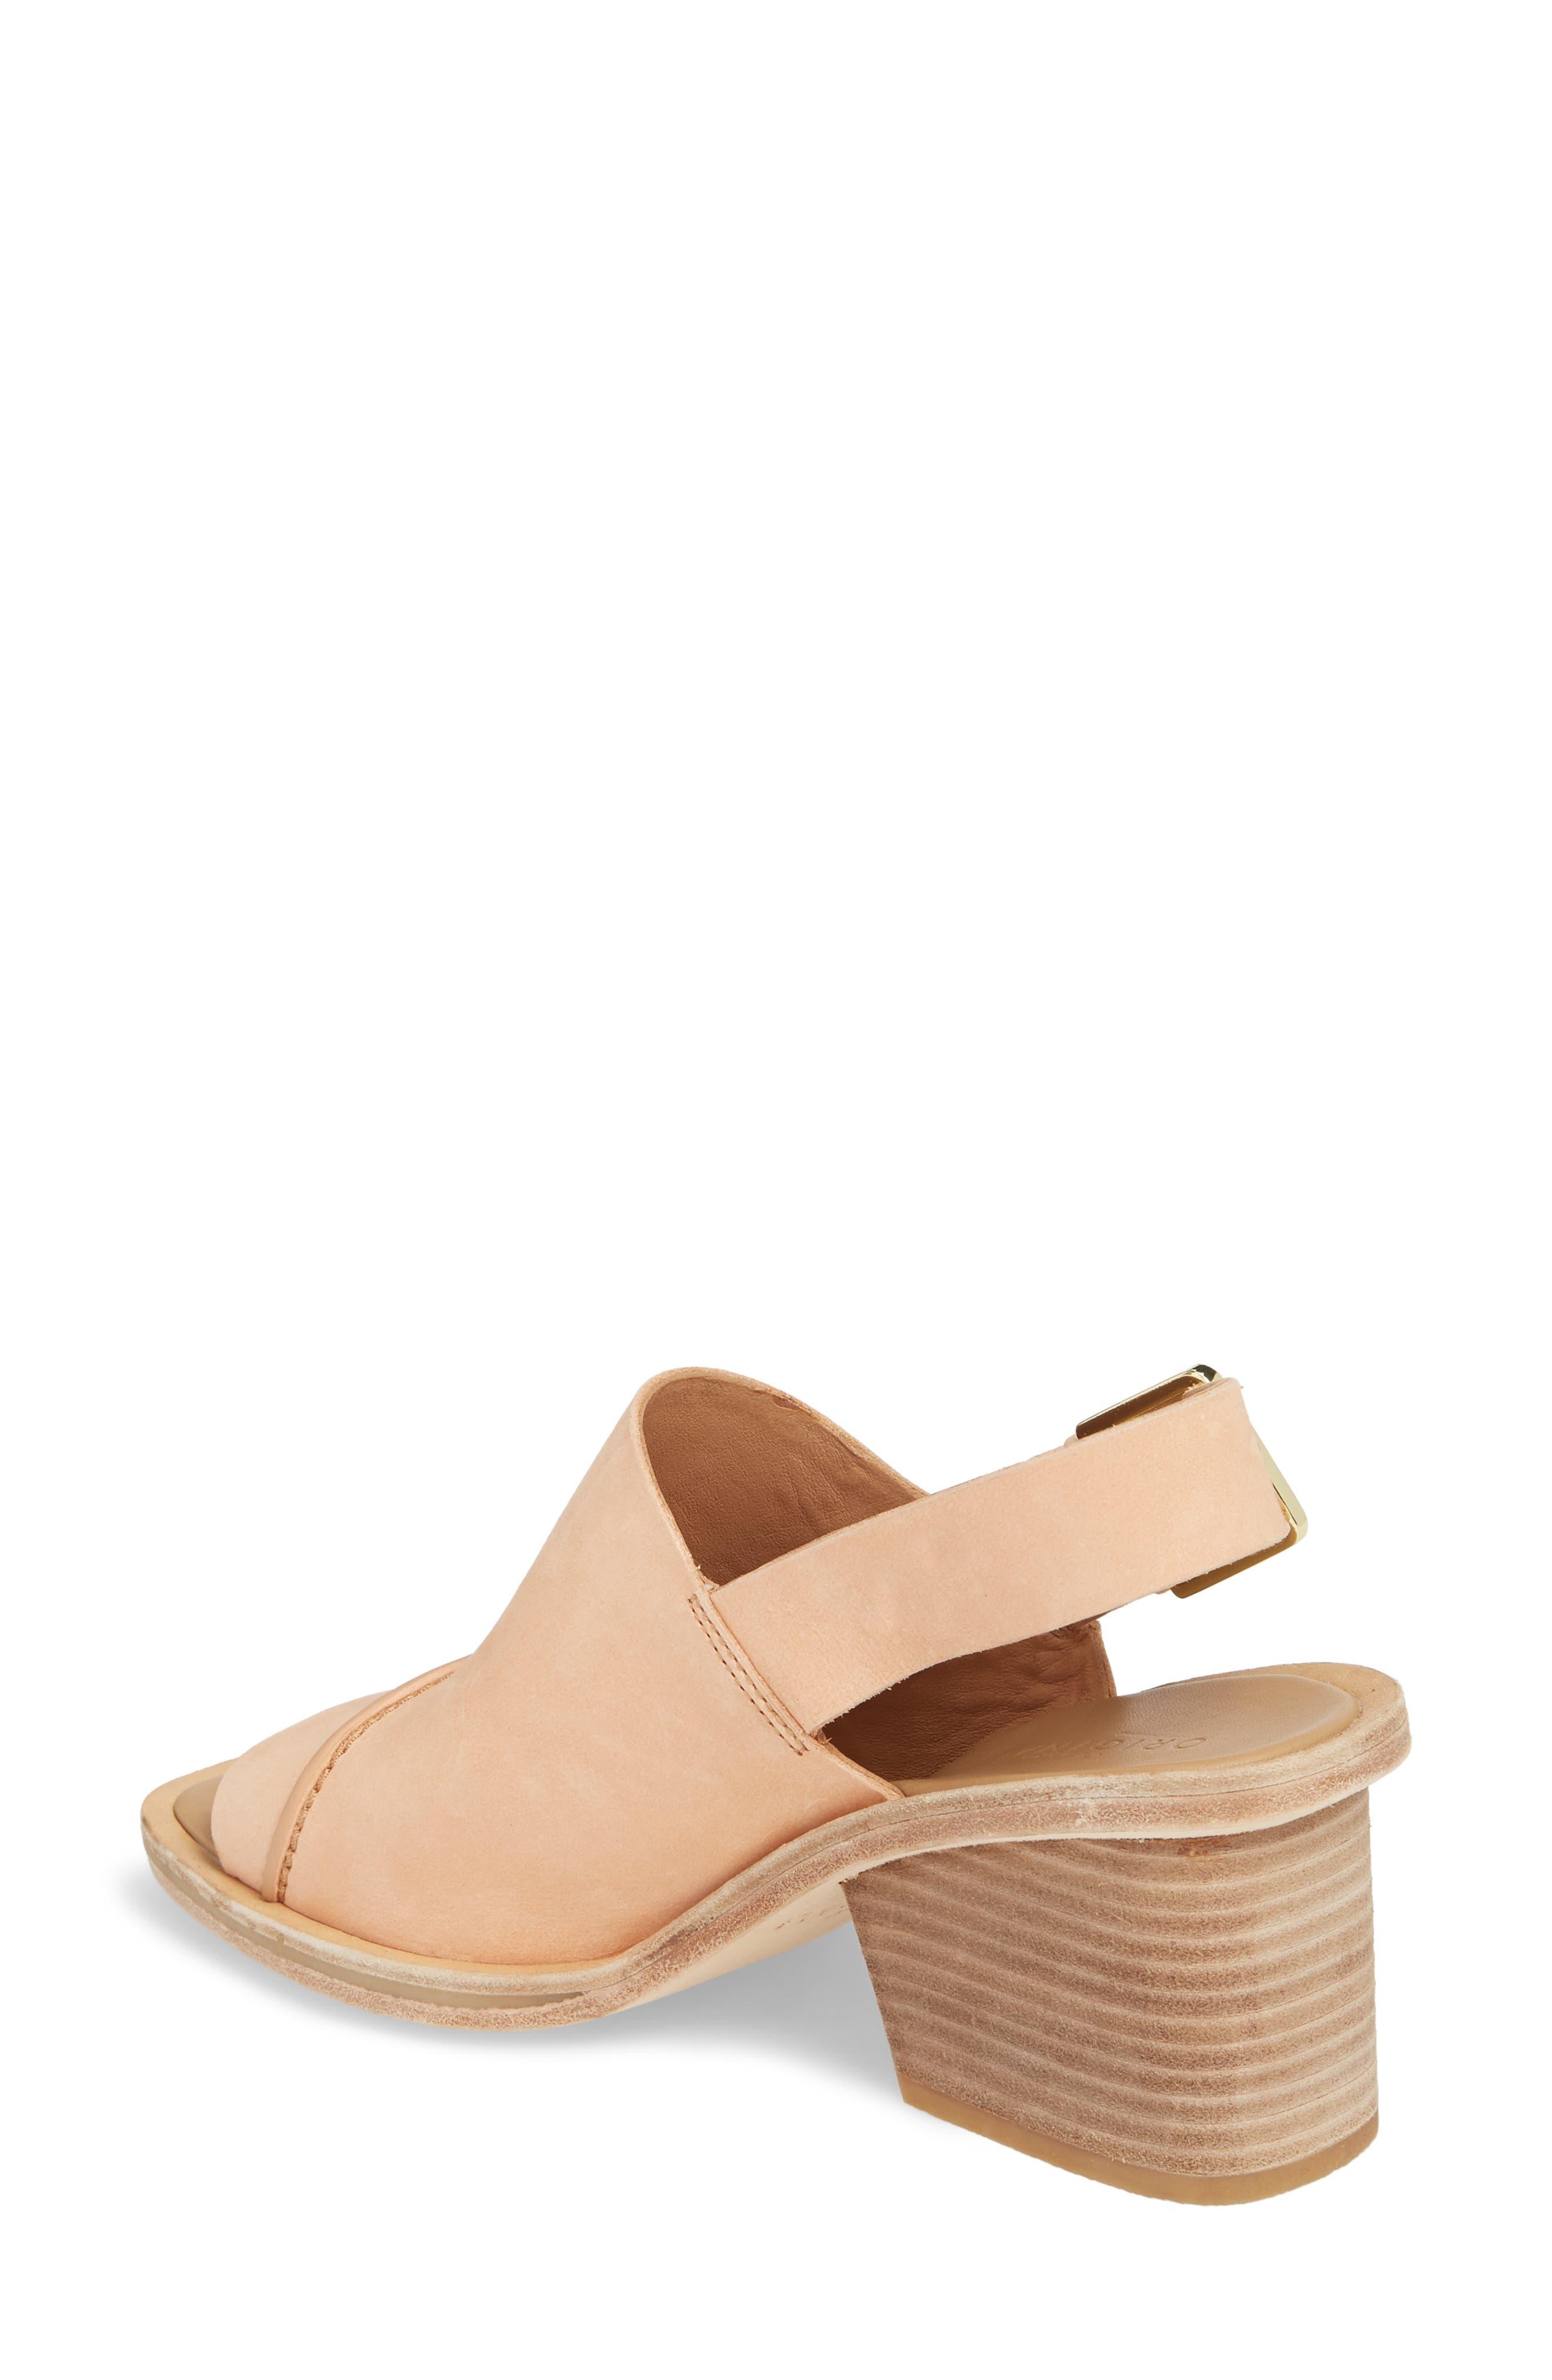 Clarks Bermudan Block Heel Sandal,                             Alternate thumbnail 2, color,                             Sandstone Nubuck Leather